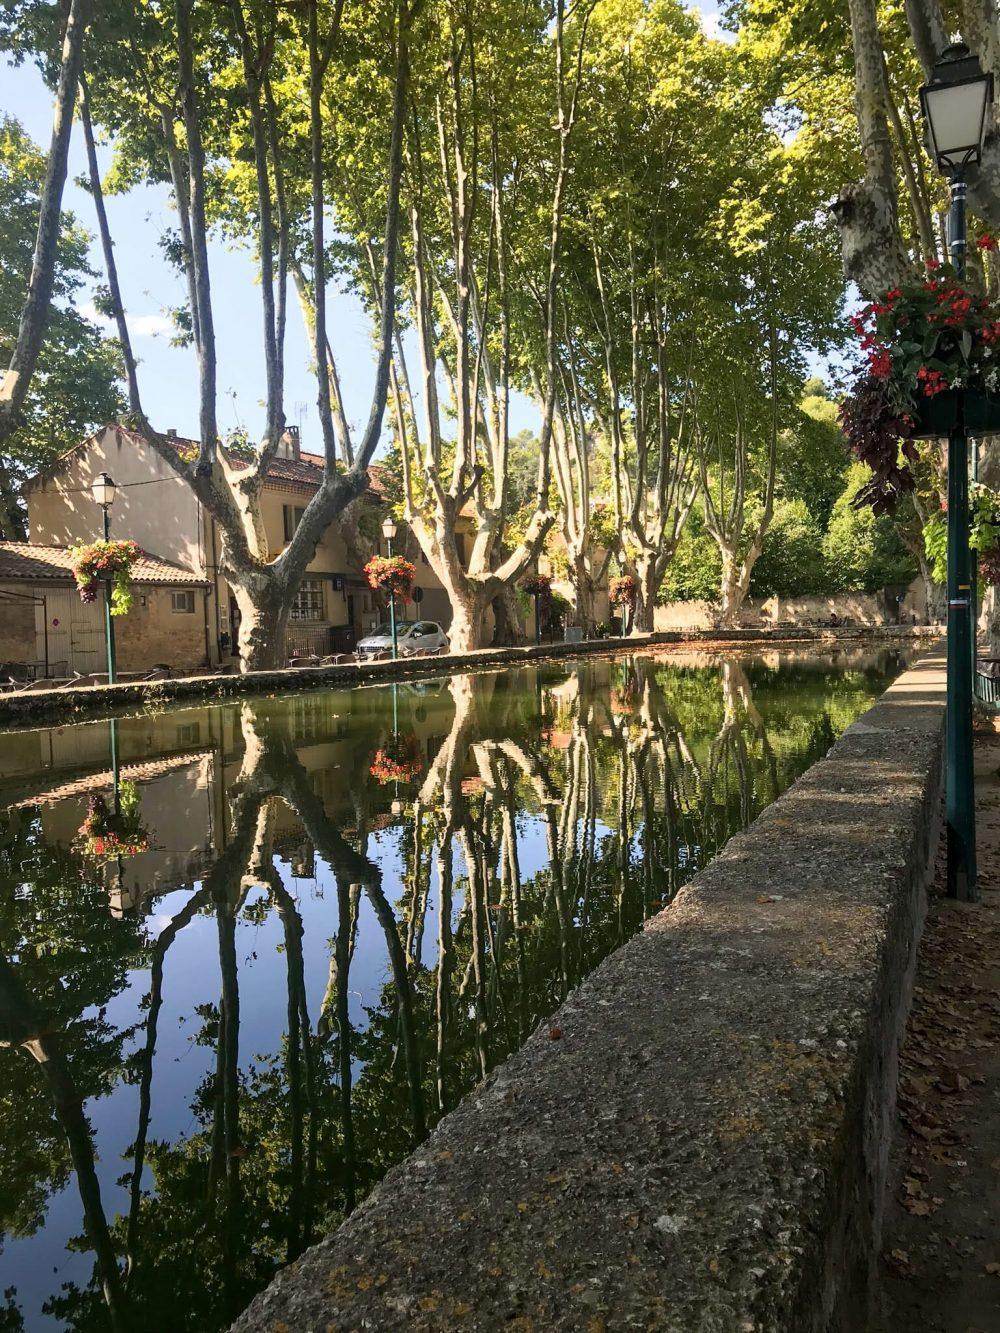 Wandering in Cucuron, France